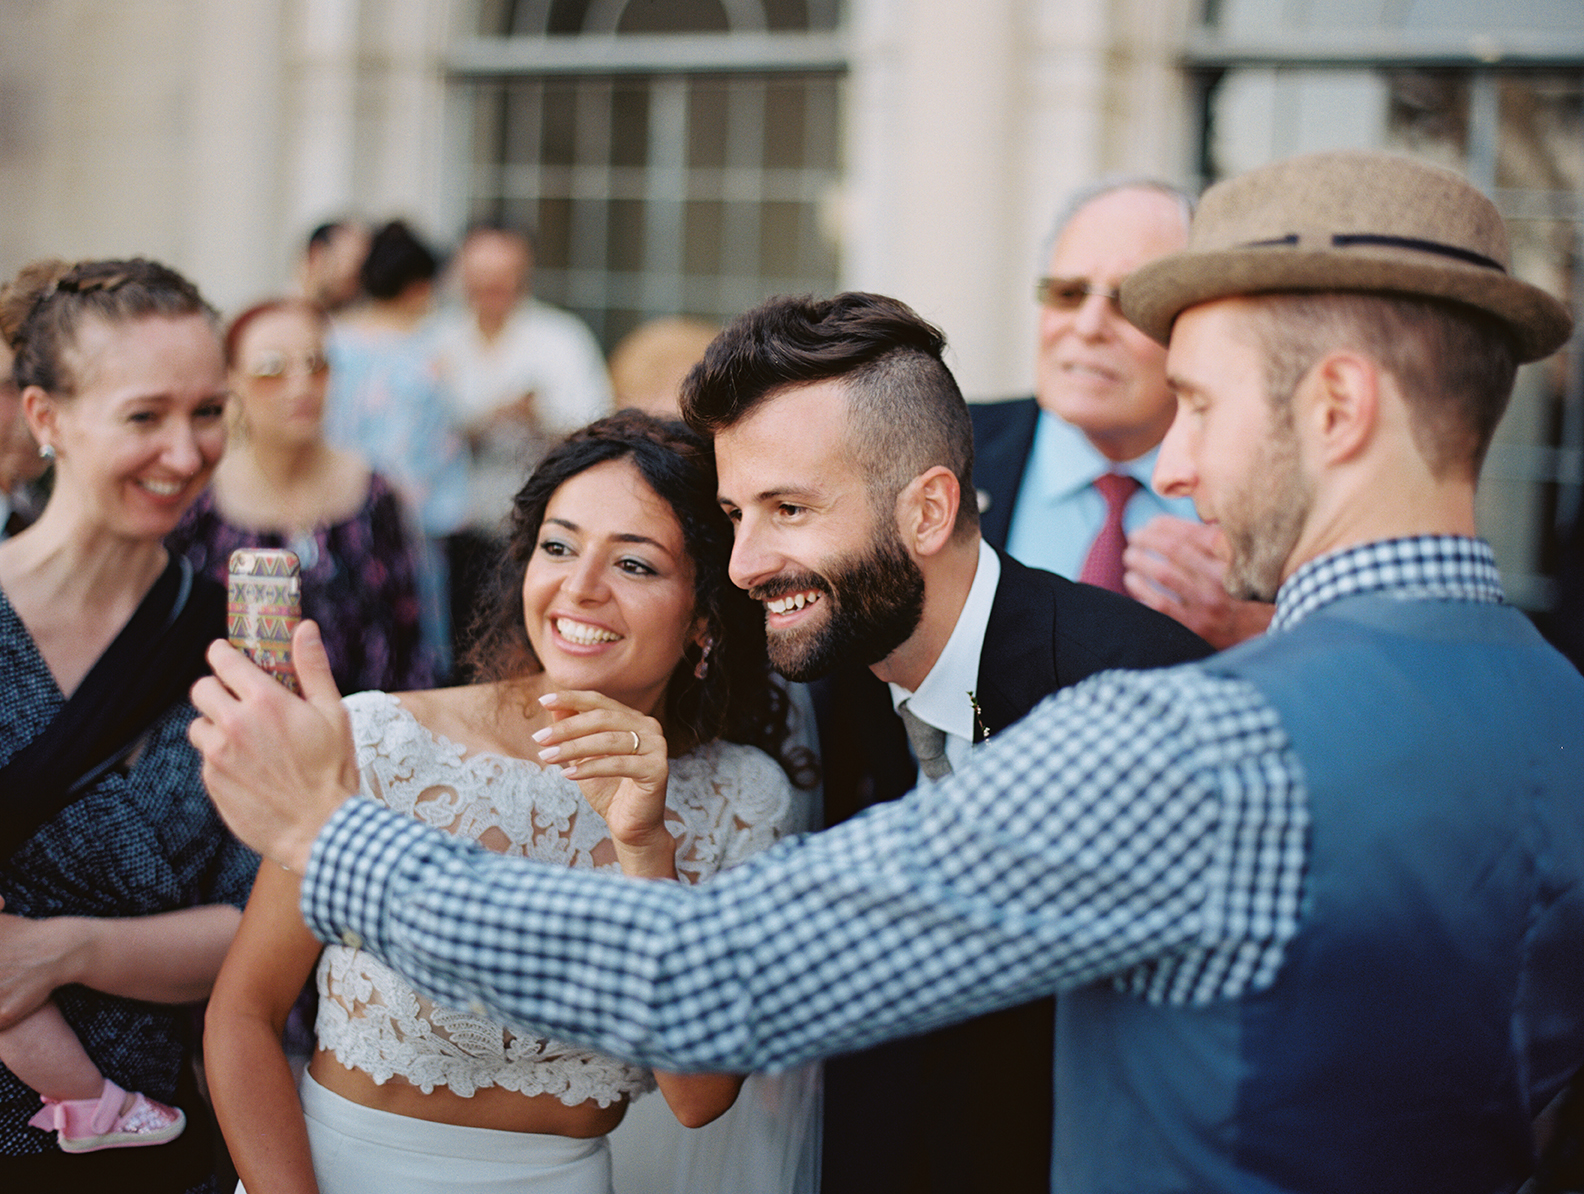 225-brian-sarra-los-angeles-wedding-brumley-wells-photography.jpg